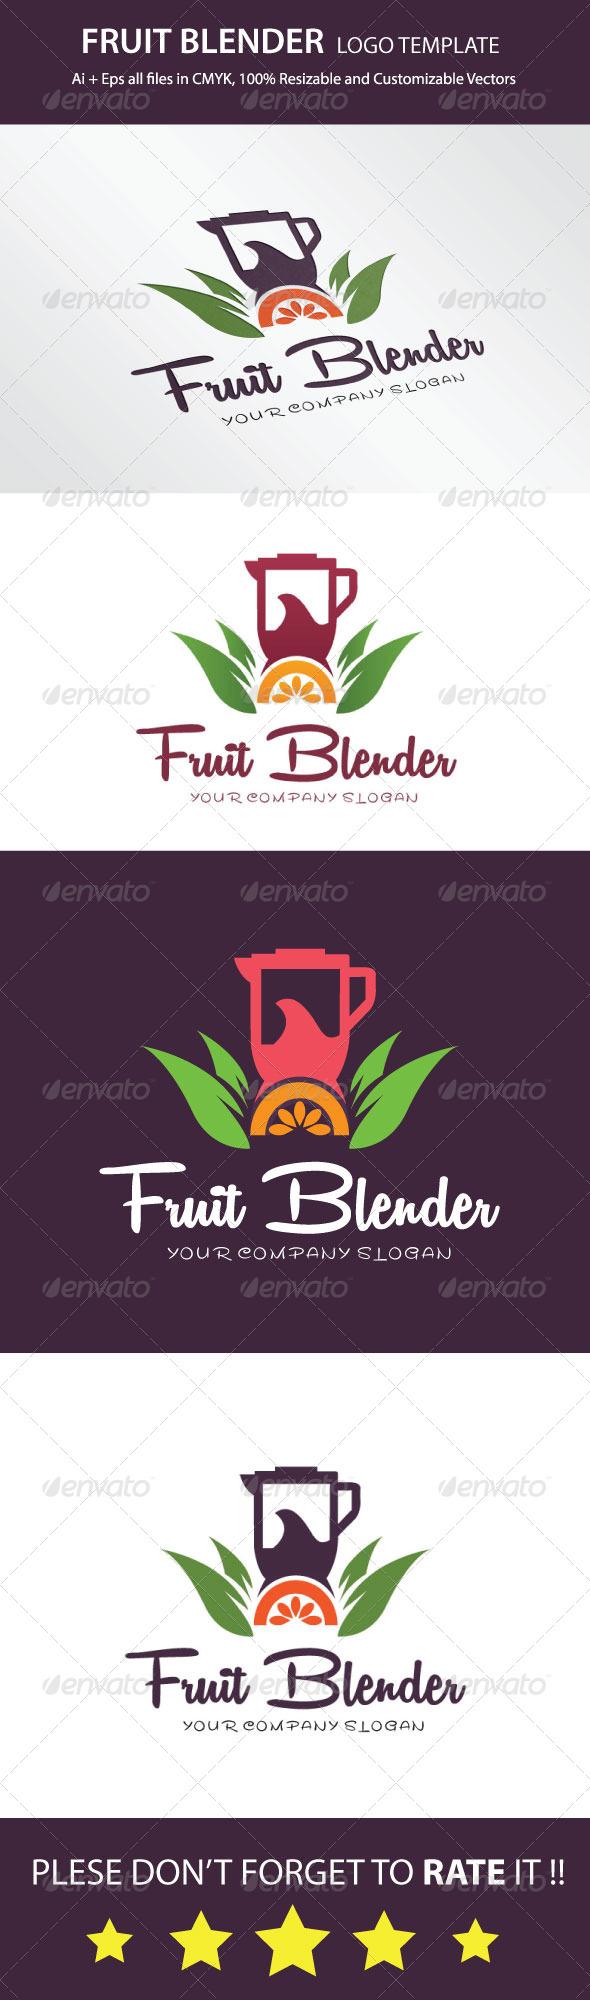 GraphicRiver Fruit Blender Logo Template 7827480